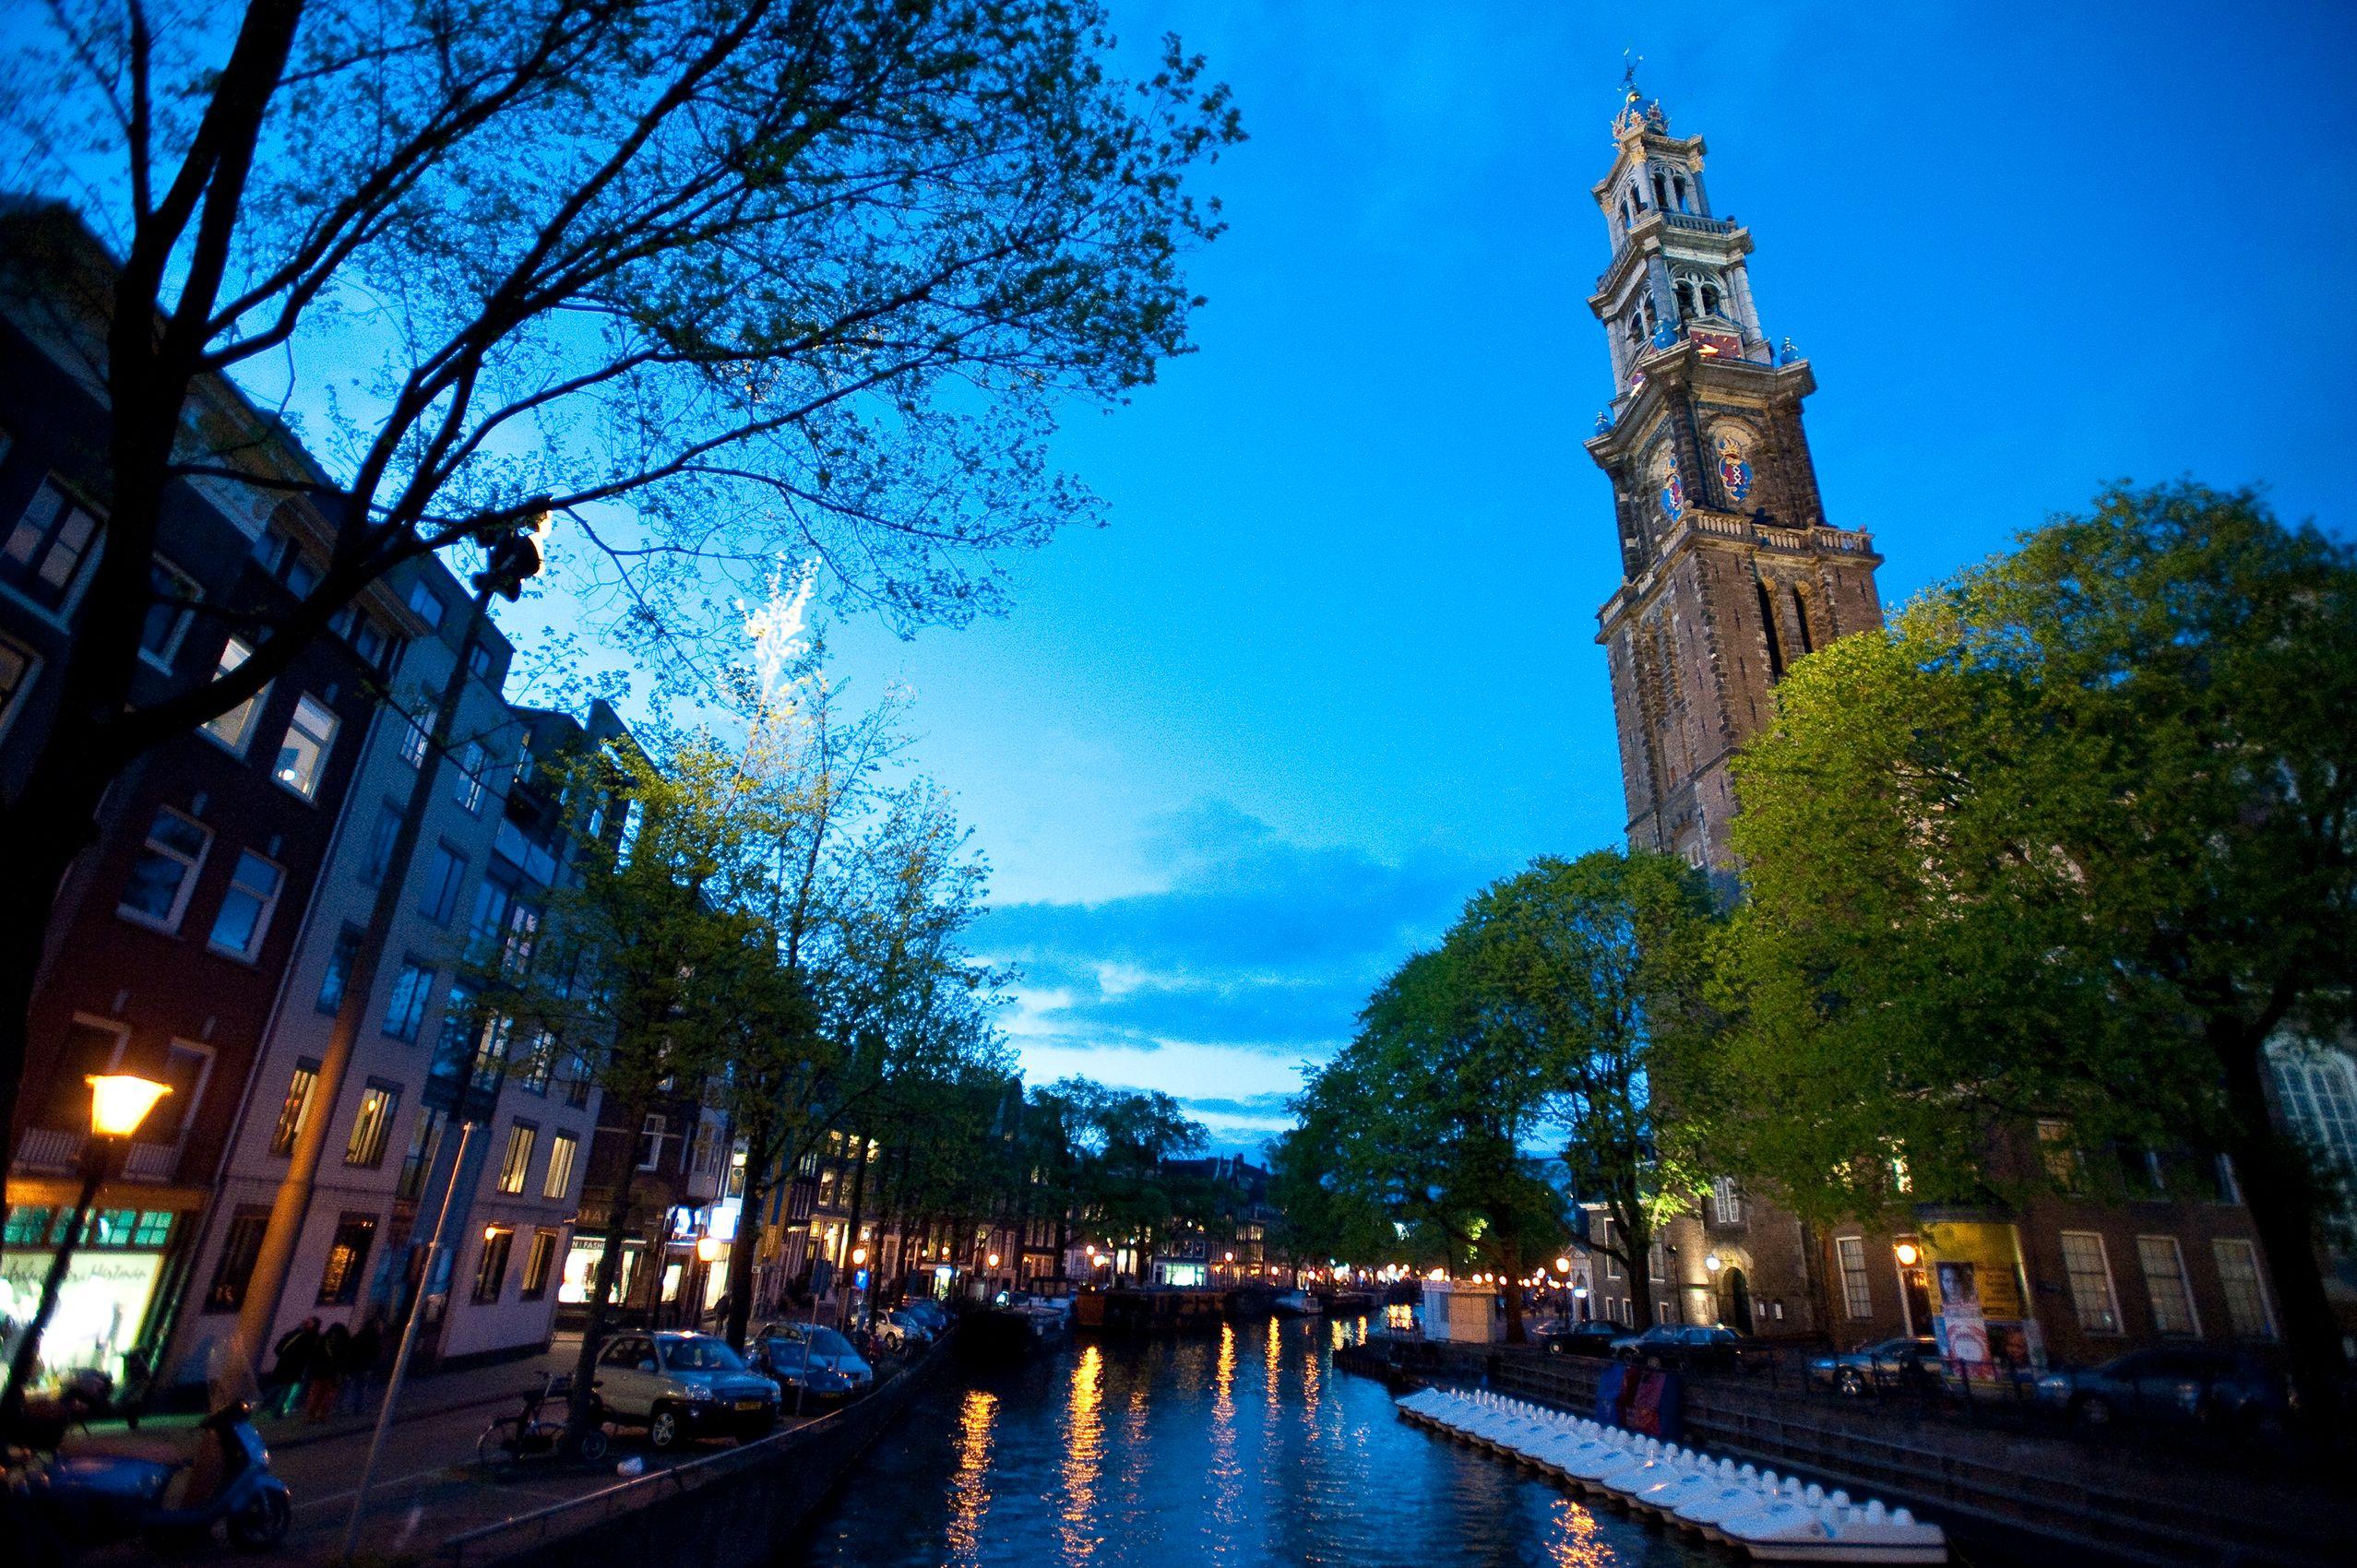 20100504_Amsterdam-304.jpg